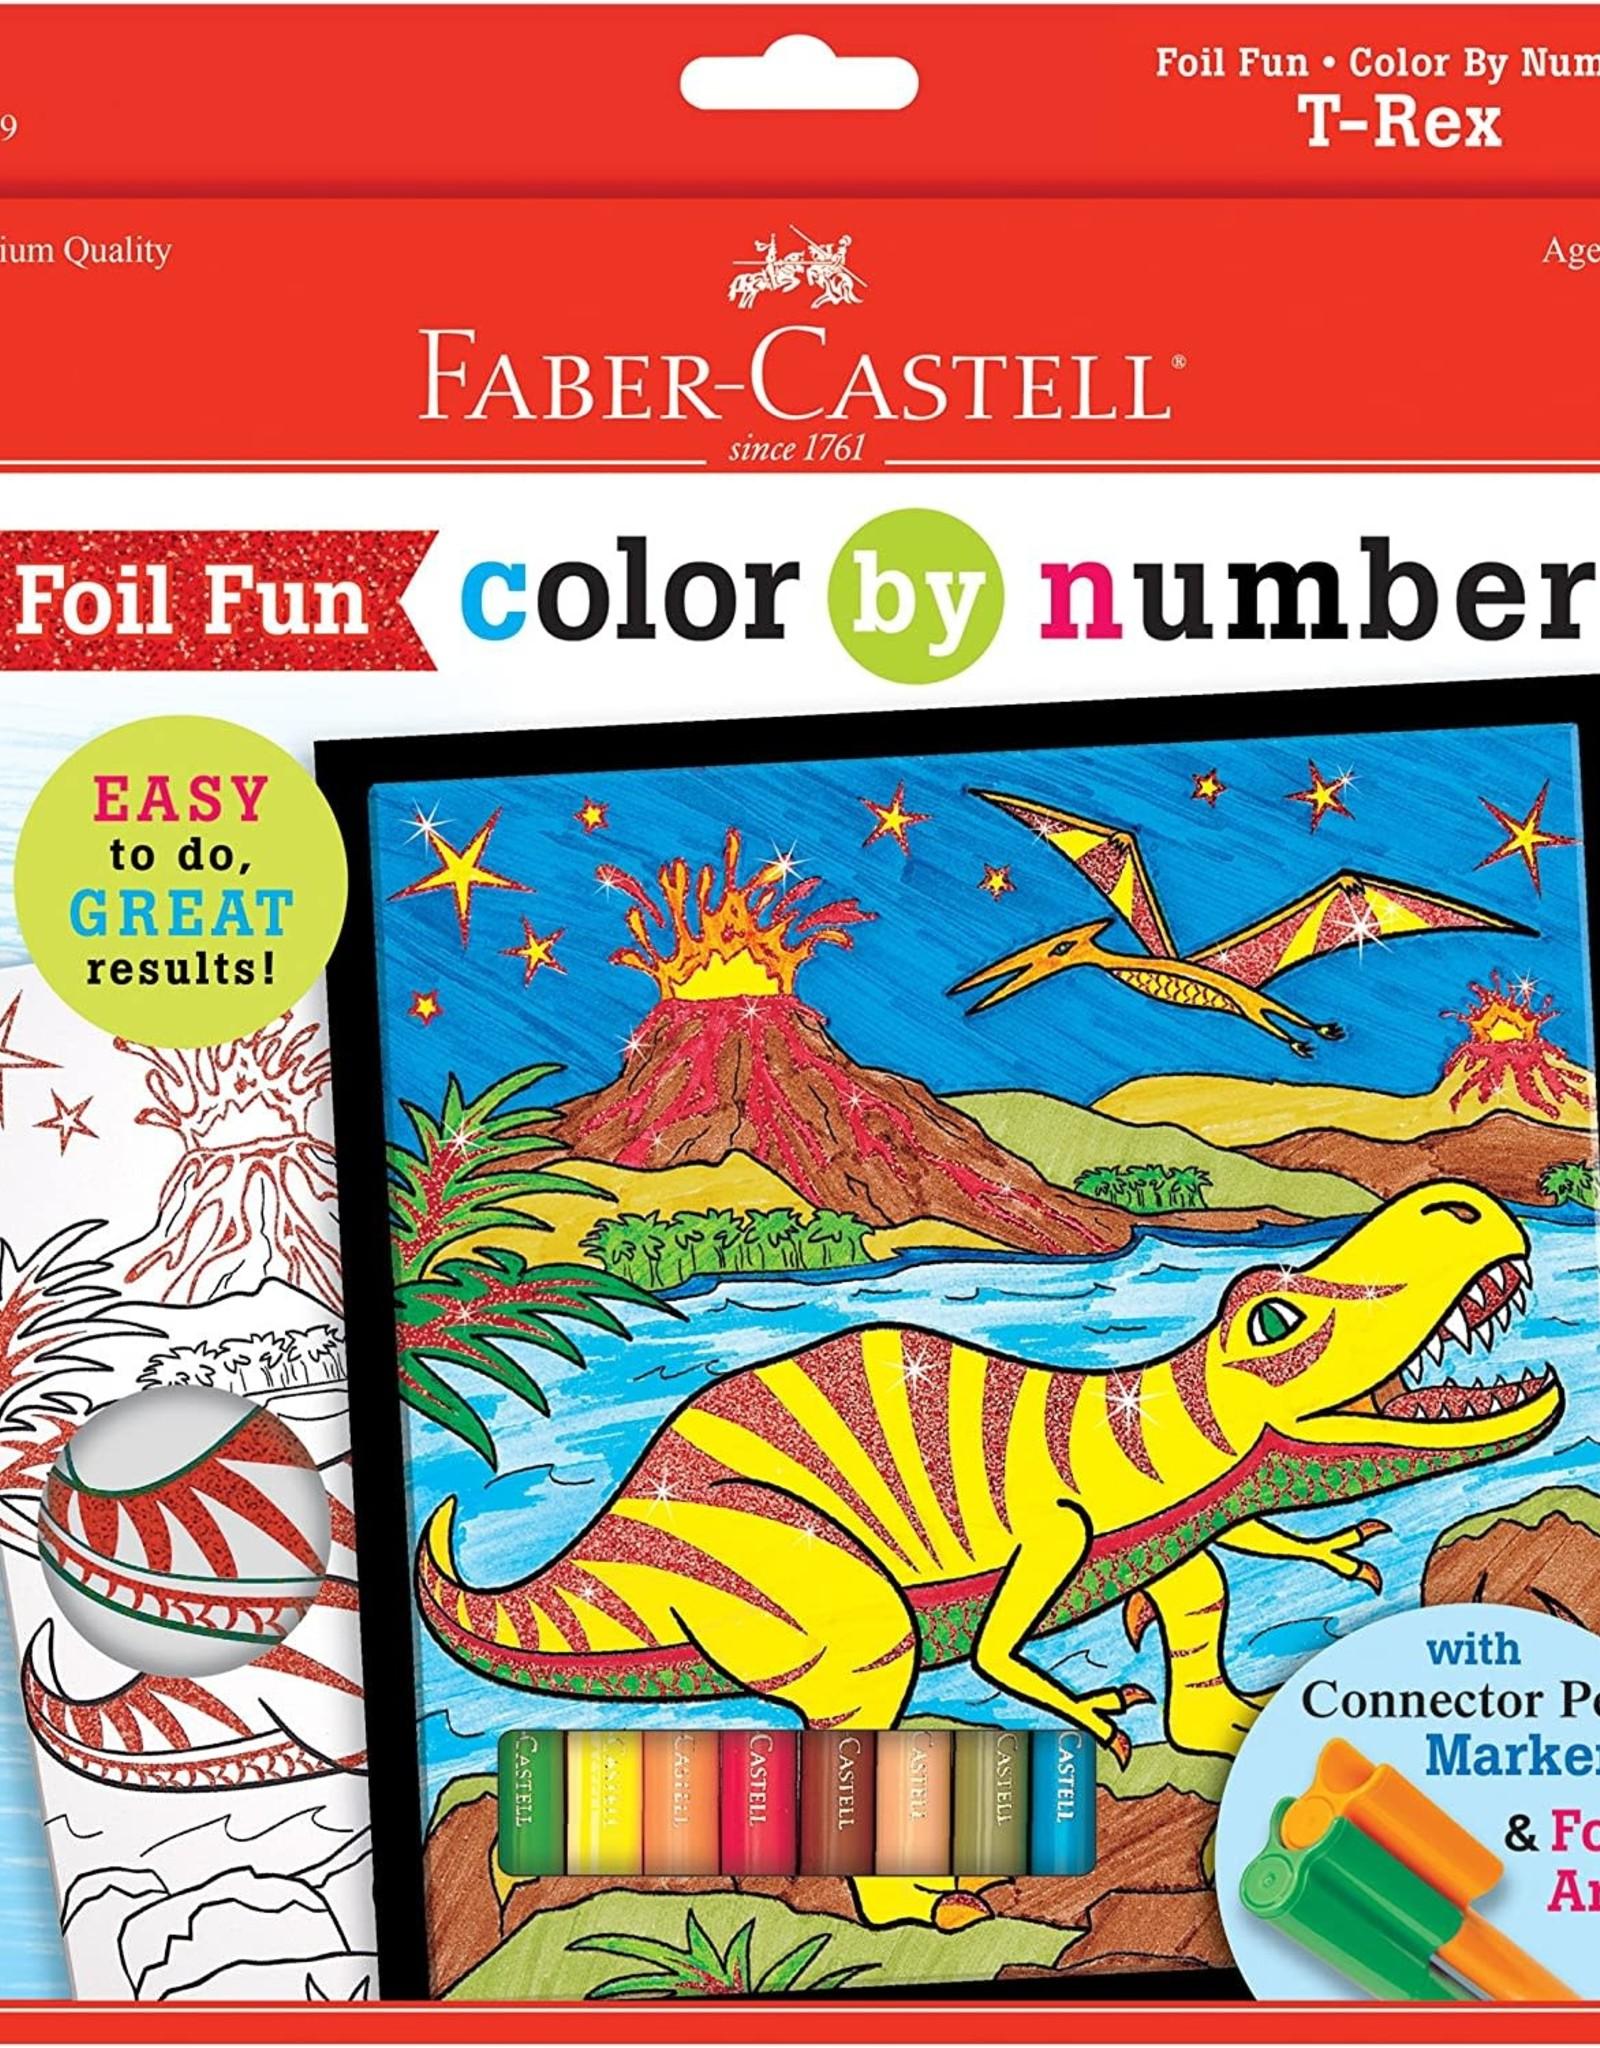 Faber-Castell Color By Number T-Rex Foil Fun